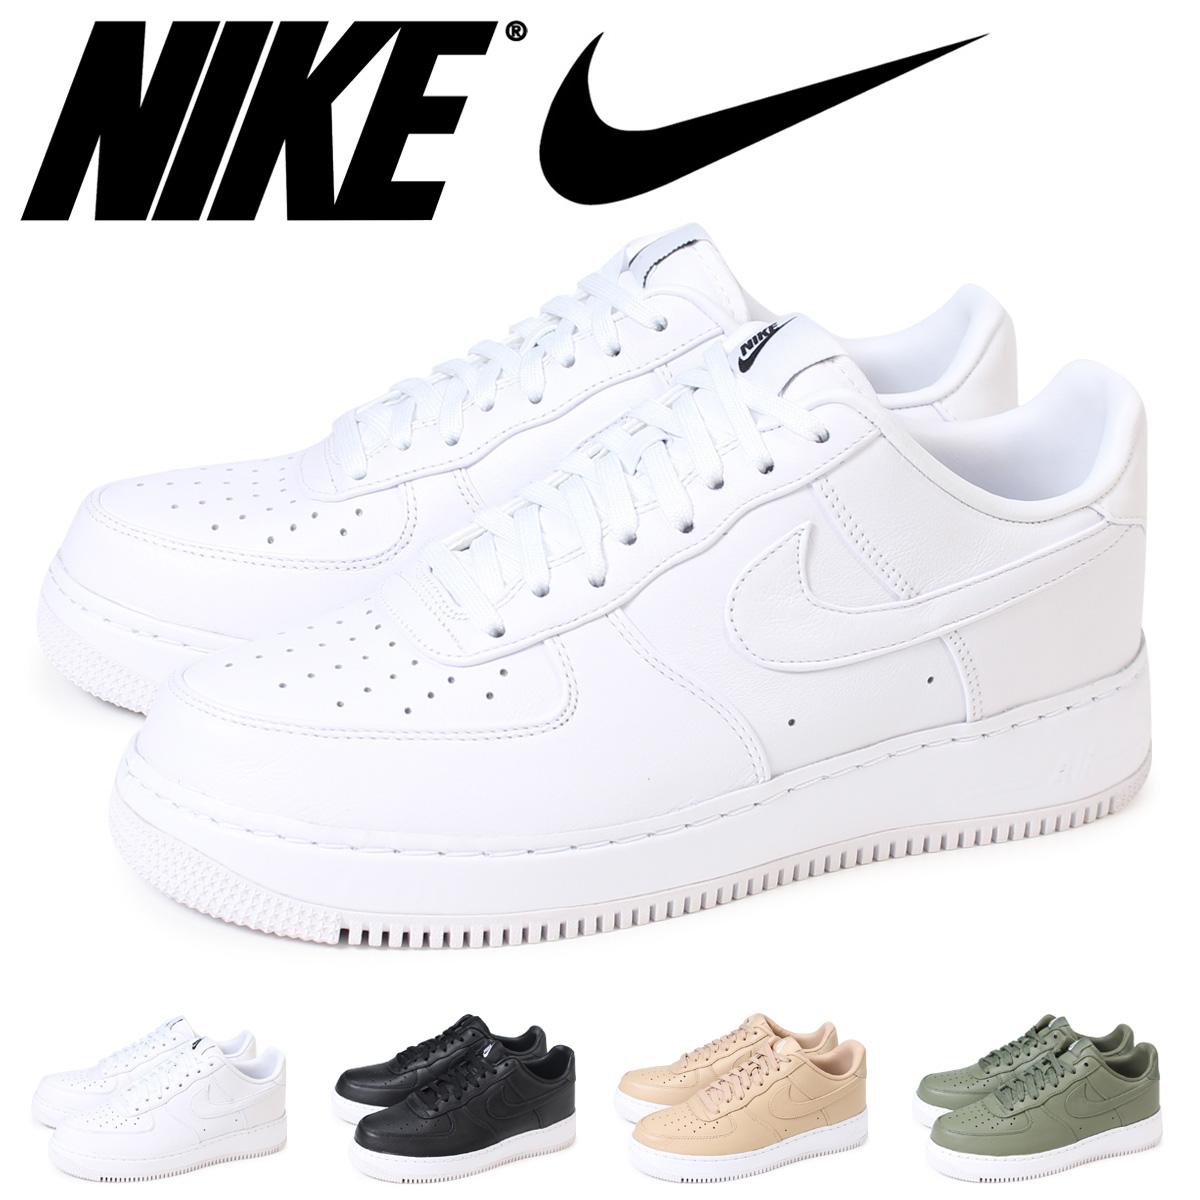 NIKE Nike air force men sneakers laboratory NIKELAB AIR FORCE 1 LOW shoes